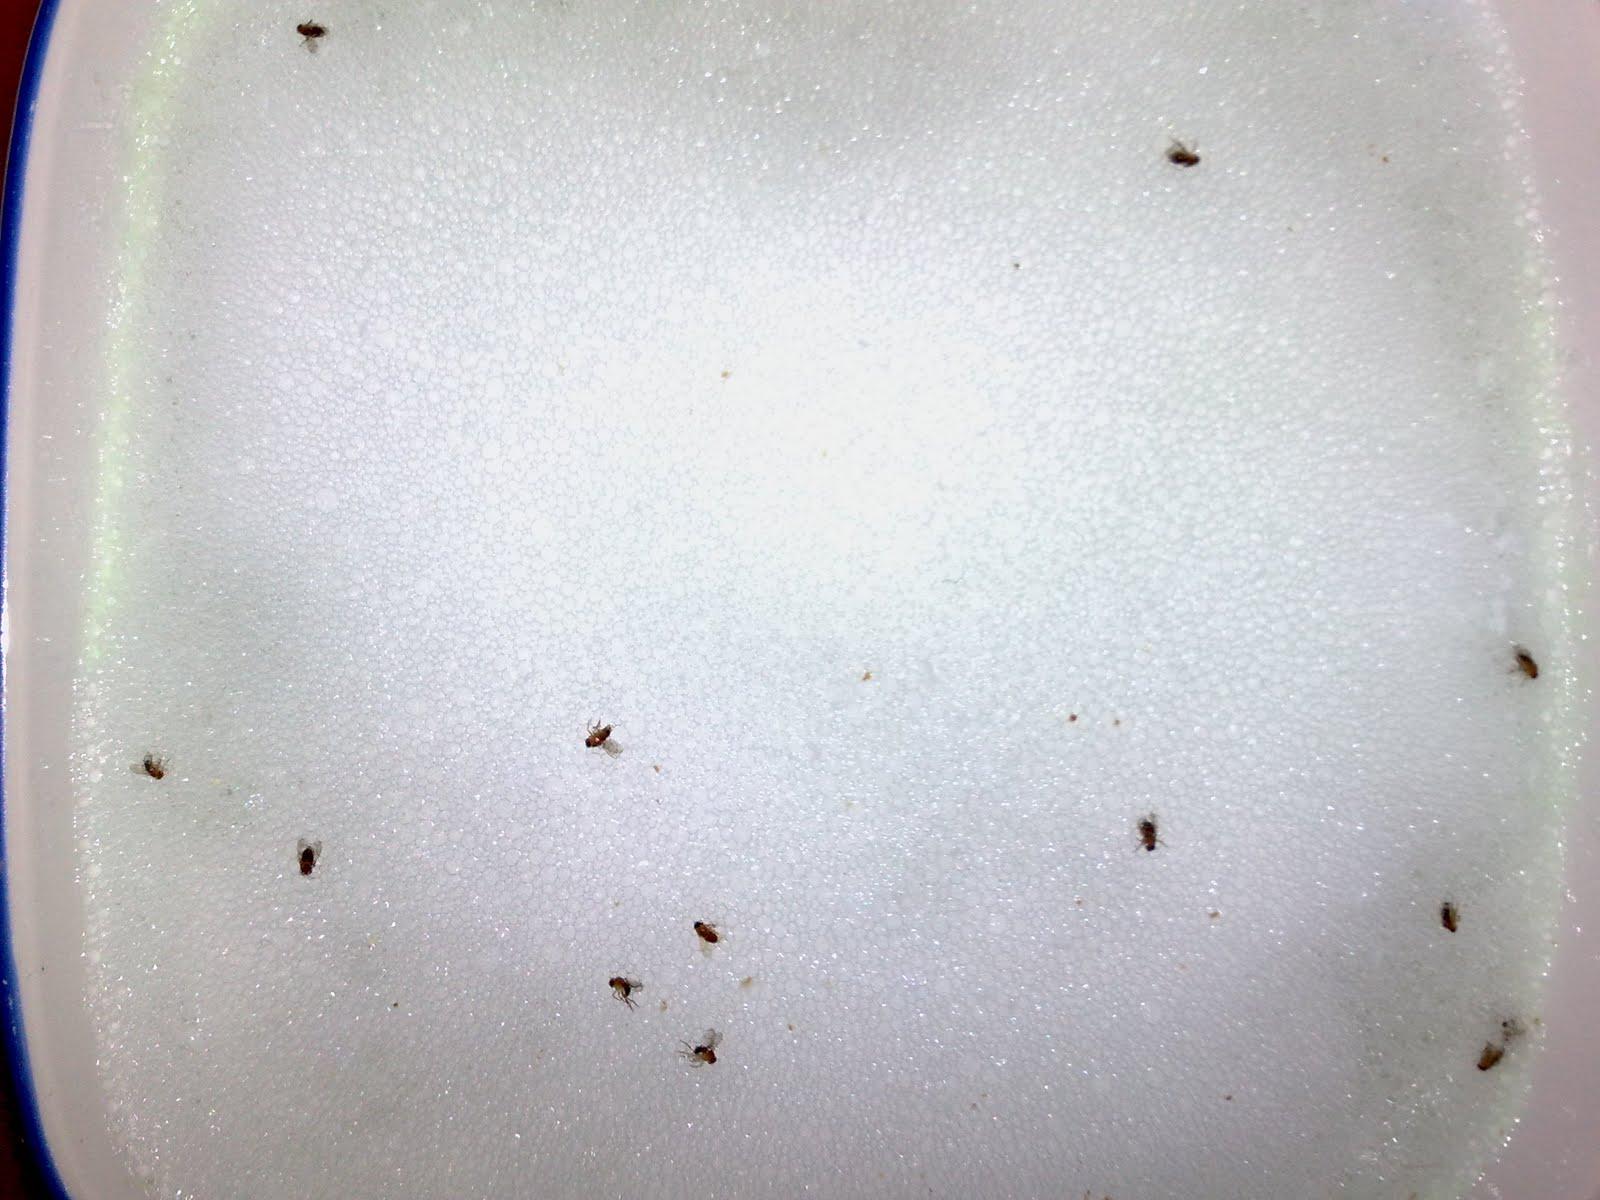 Gnats in bathroom sink drain carpenter bees nest